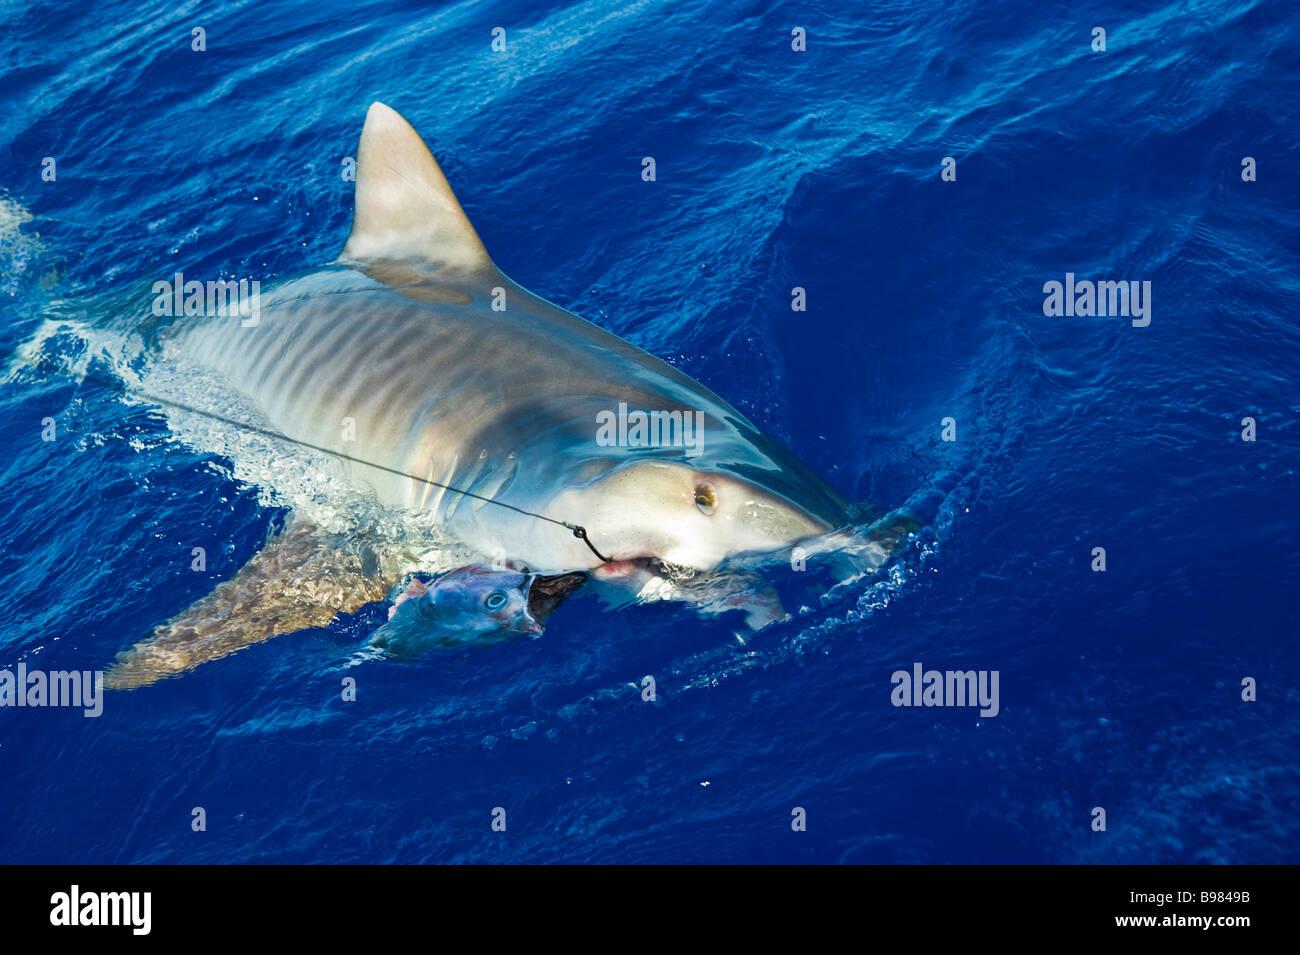 Catch of tiger shark big game fishing La Reunion France   Tigerhai, Fang am Haken, Hochseeangeln, La ReunionLa Réunion, Stock Photo